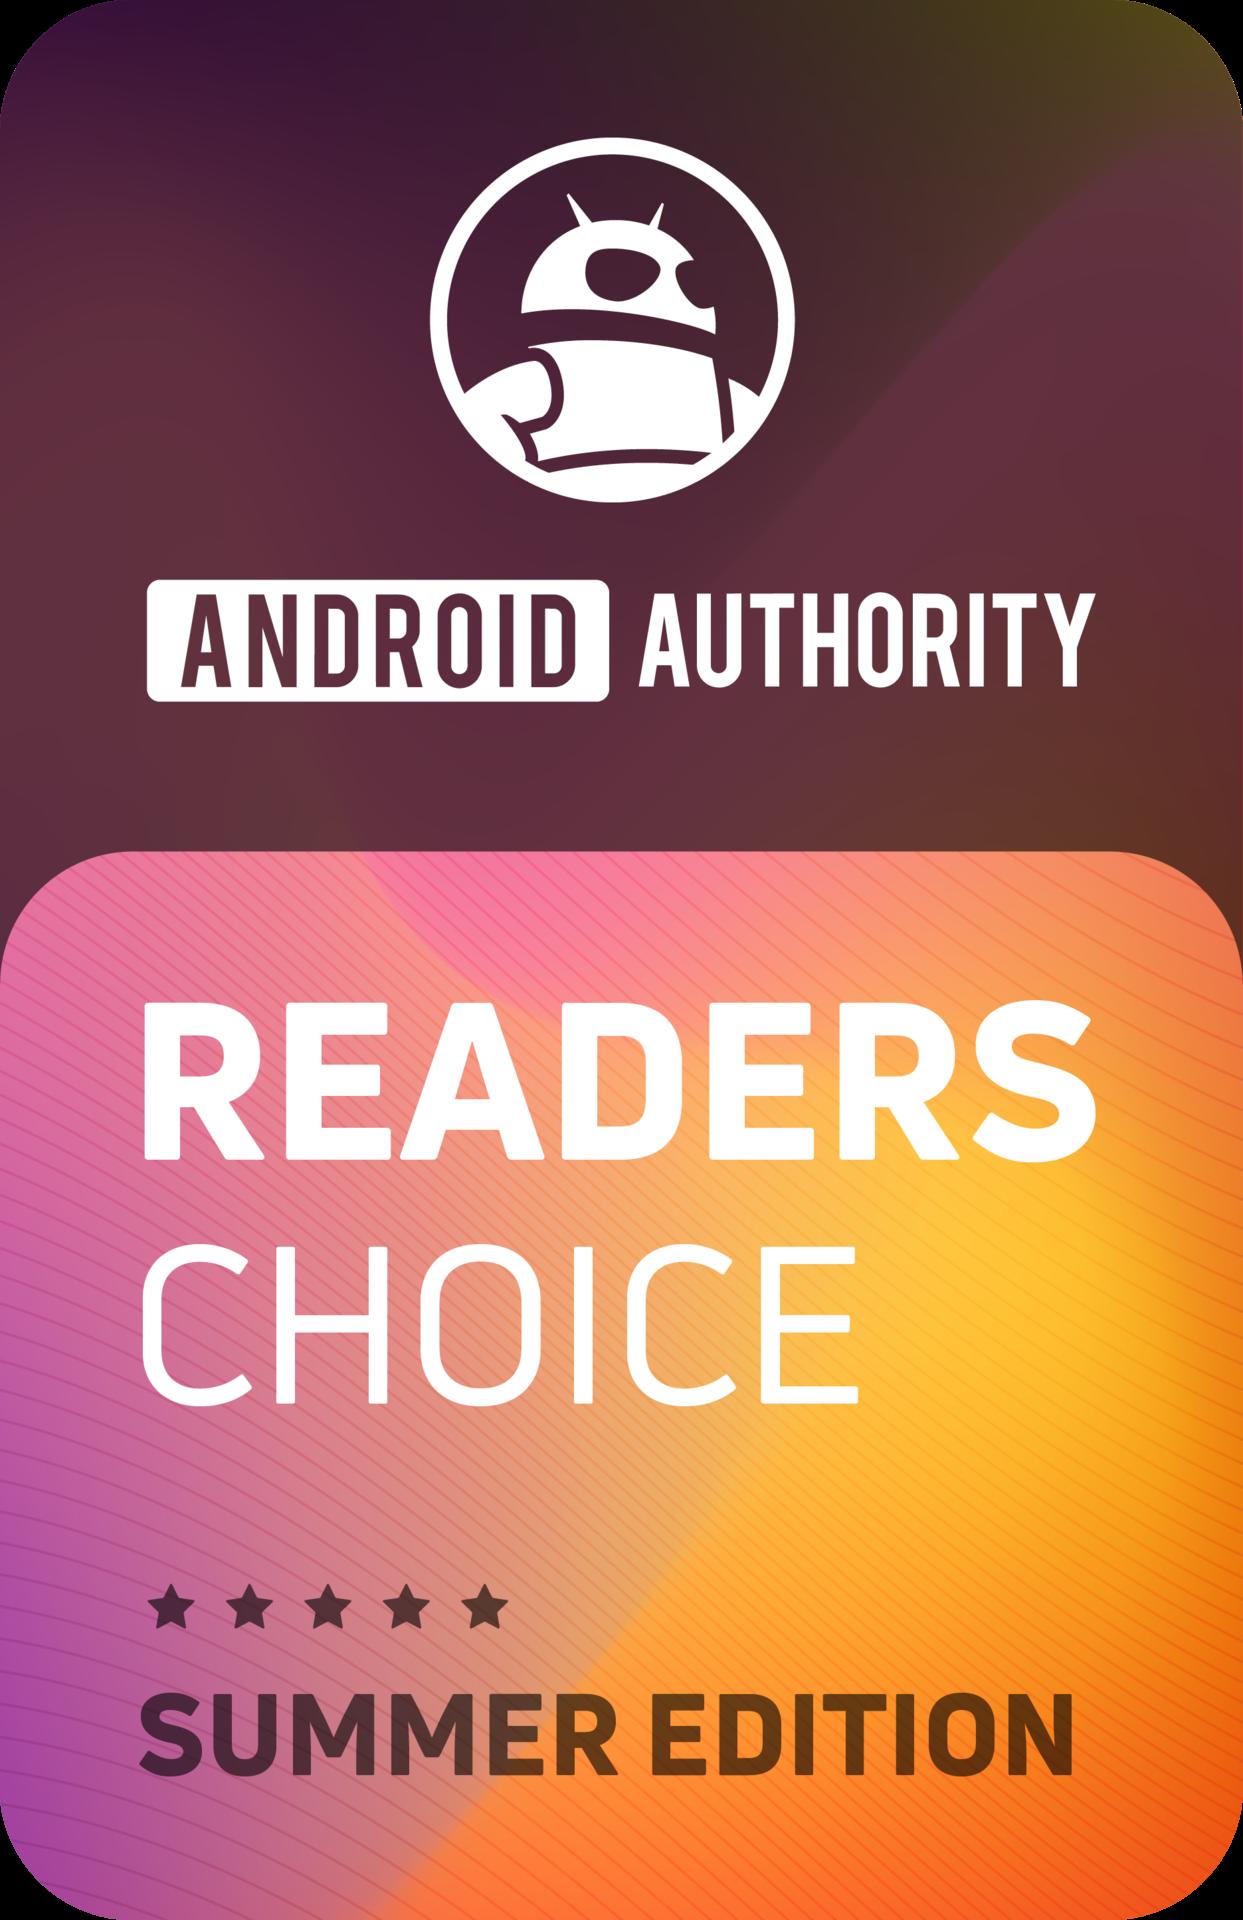 Readers choice summer